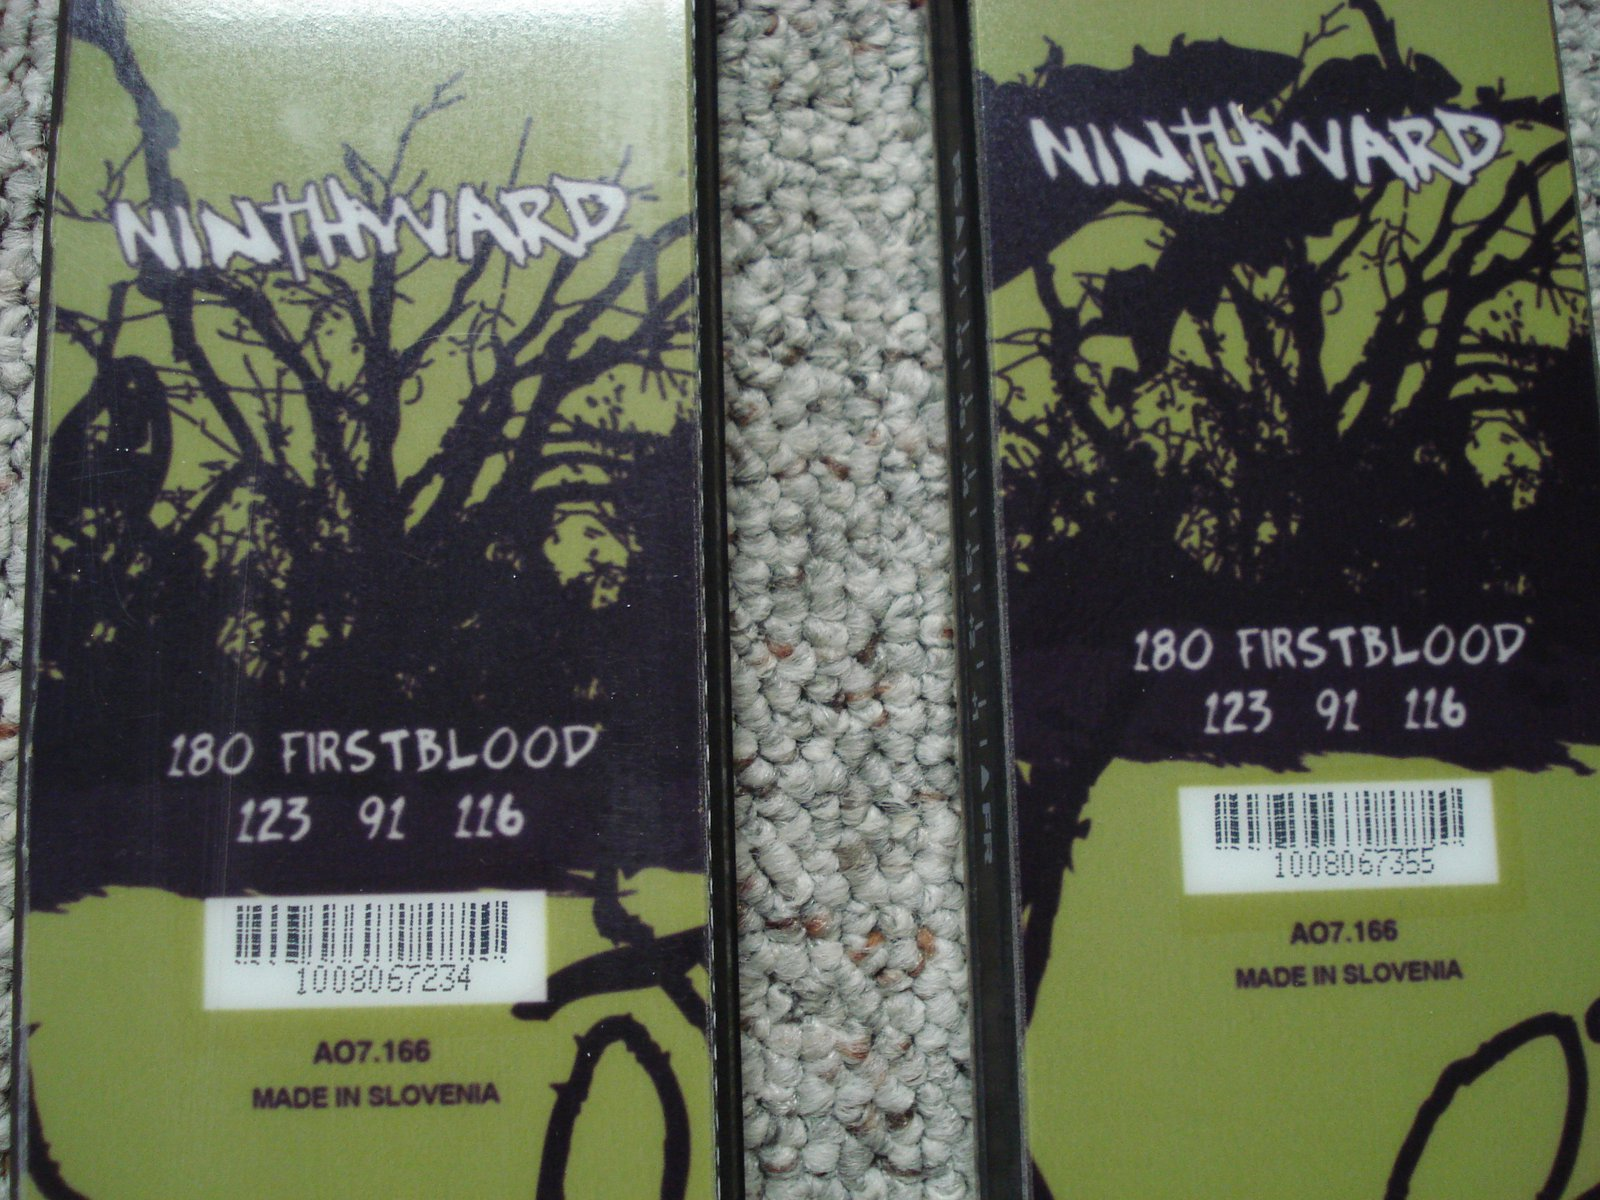 Nineward first bloods